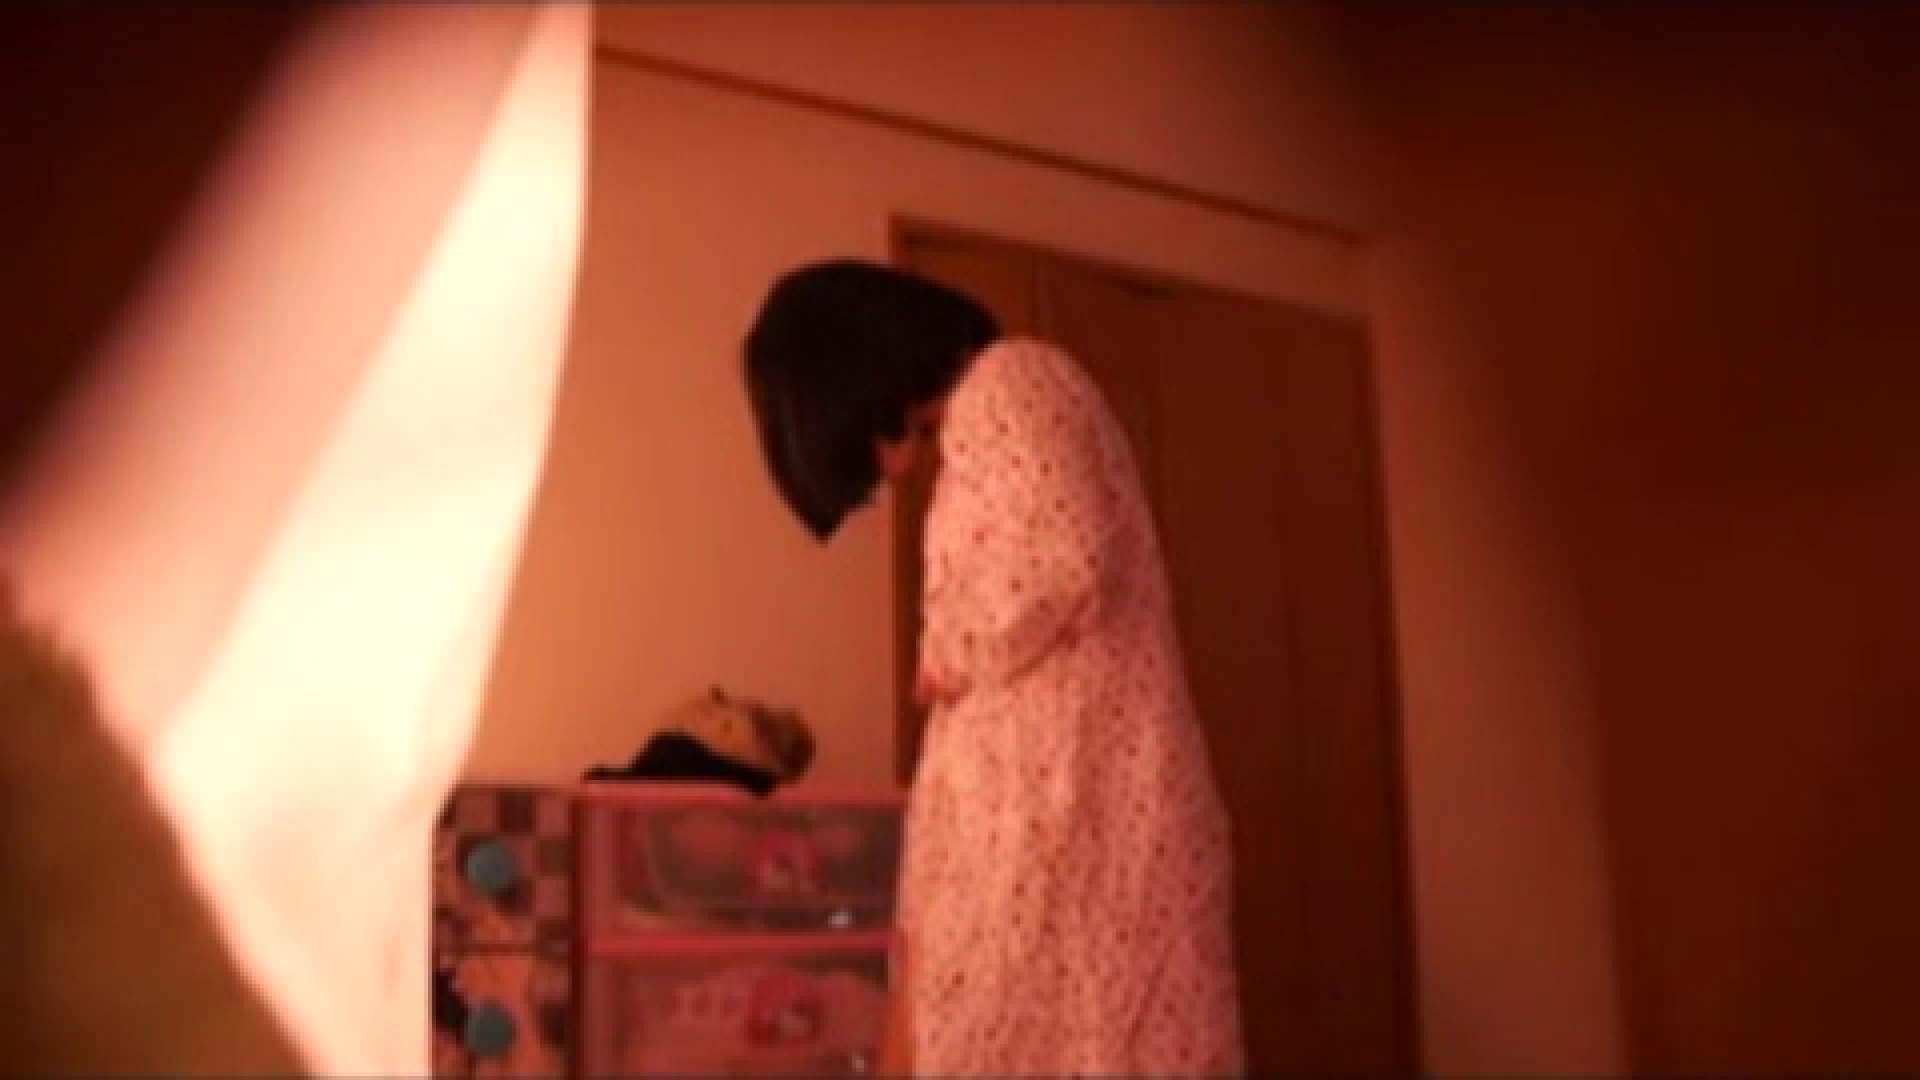 vol.2 まりこさんのお着替え、就寝前の映像です。 アラ30 戯れ無修正画像 71画像 68